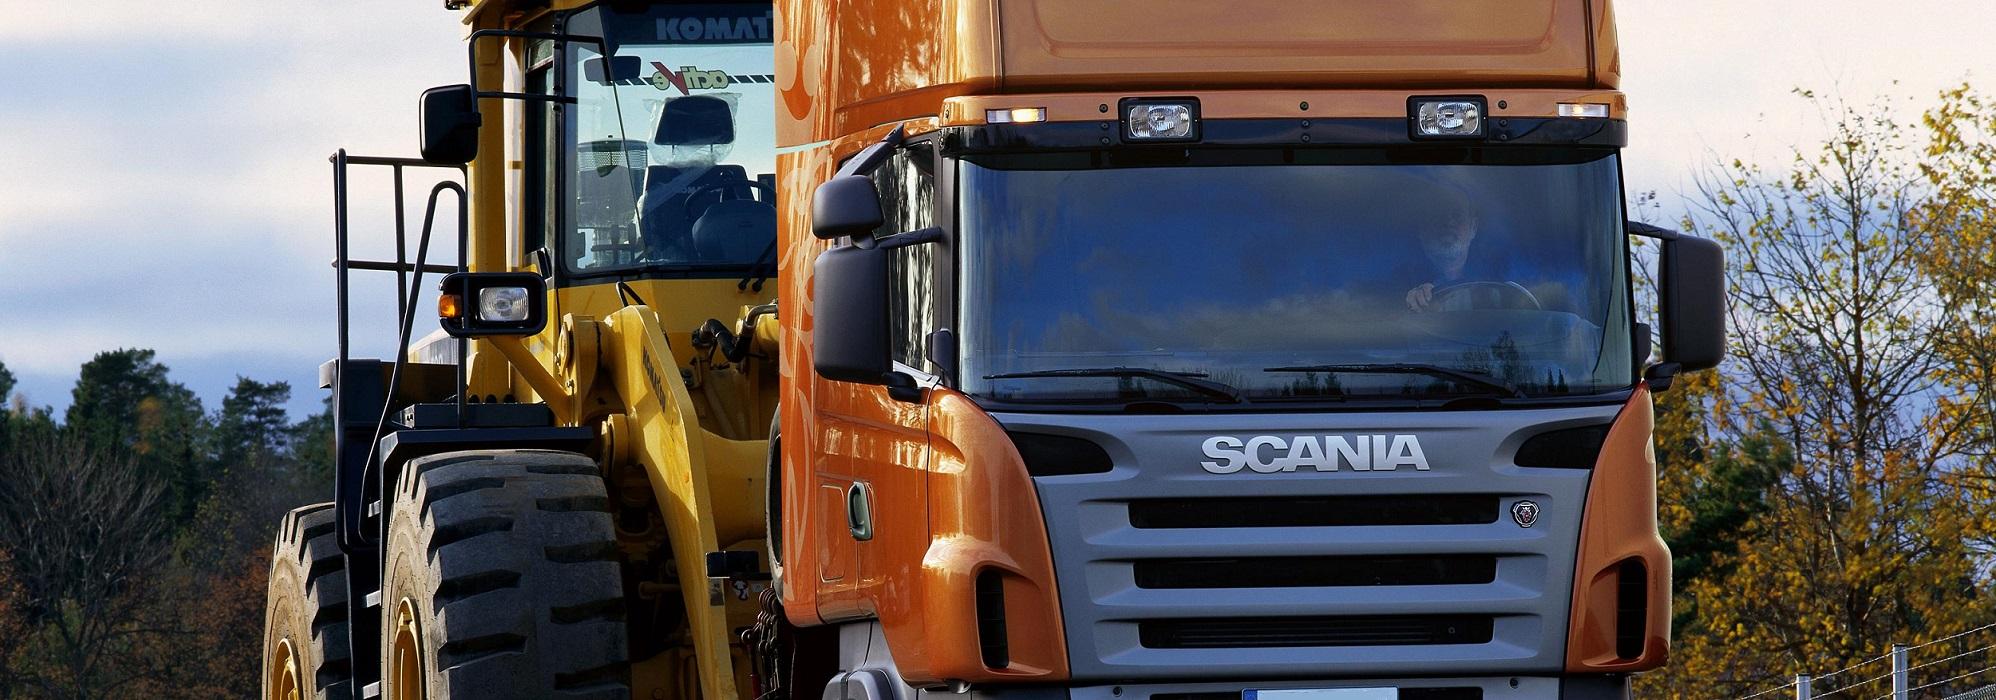 scania-truck_2